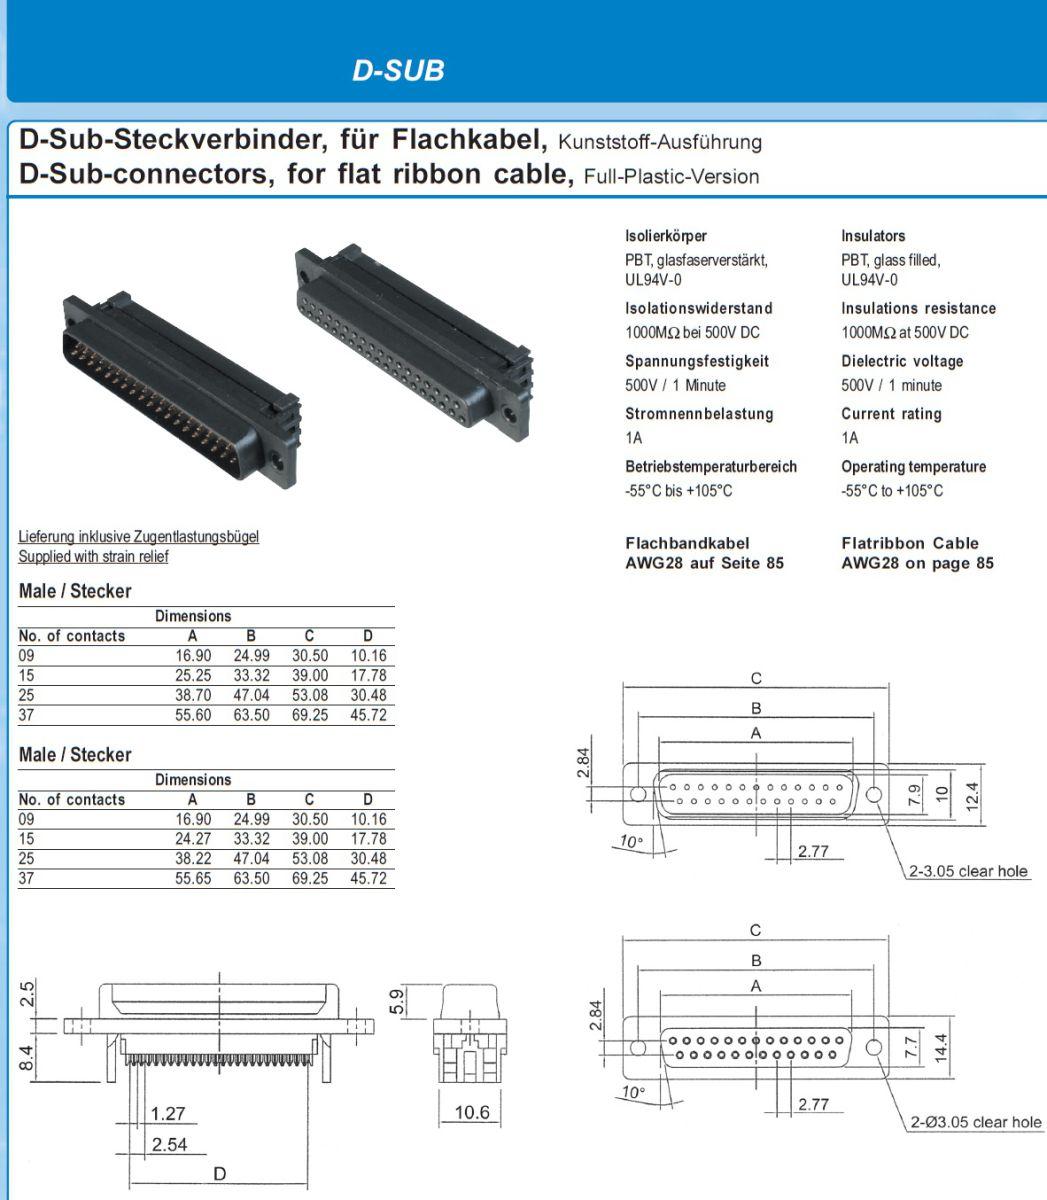 9932 10 poleribbon to 9 pole dsub connector male dimensions etc